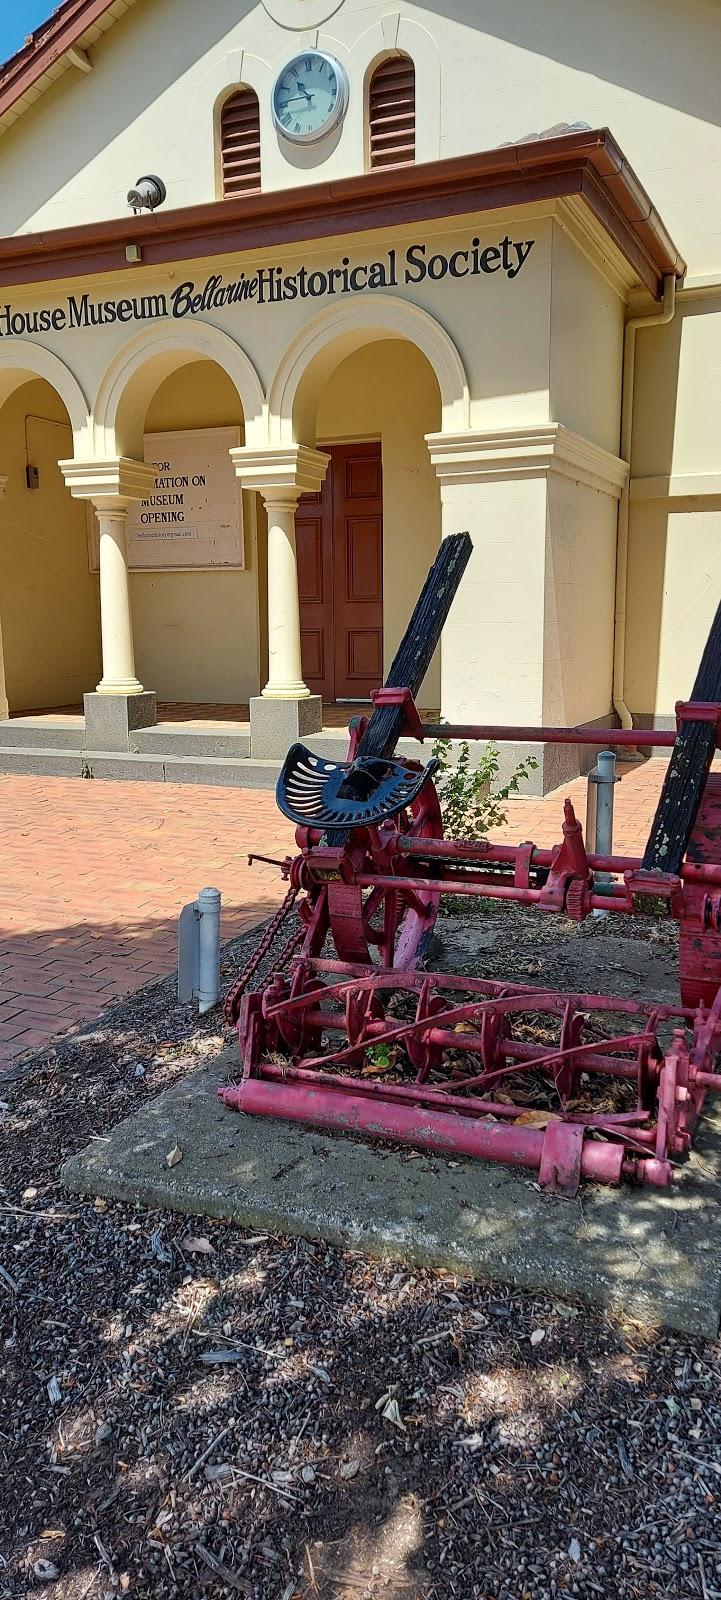 Bellarine Historical Society | museum | 11 High St, Drysdale VIC 3222, Australia